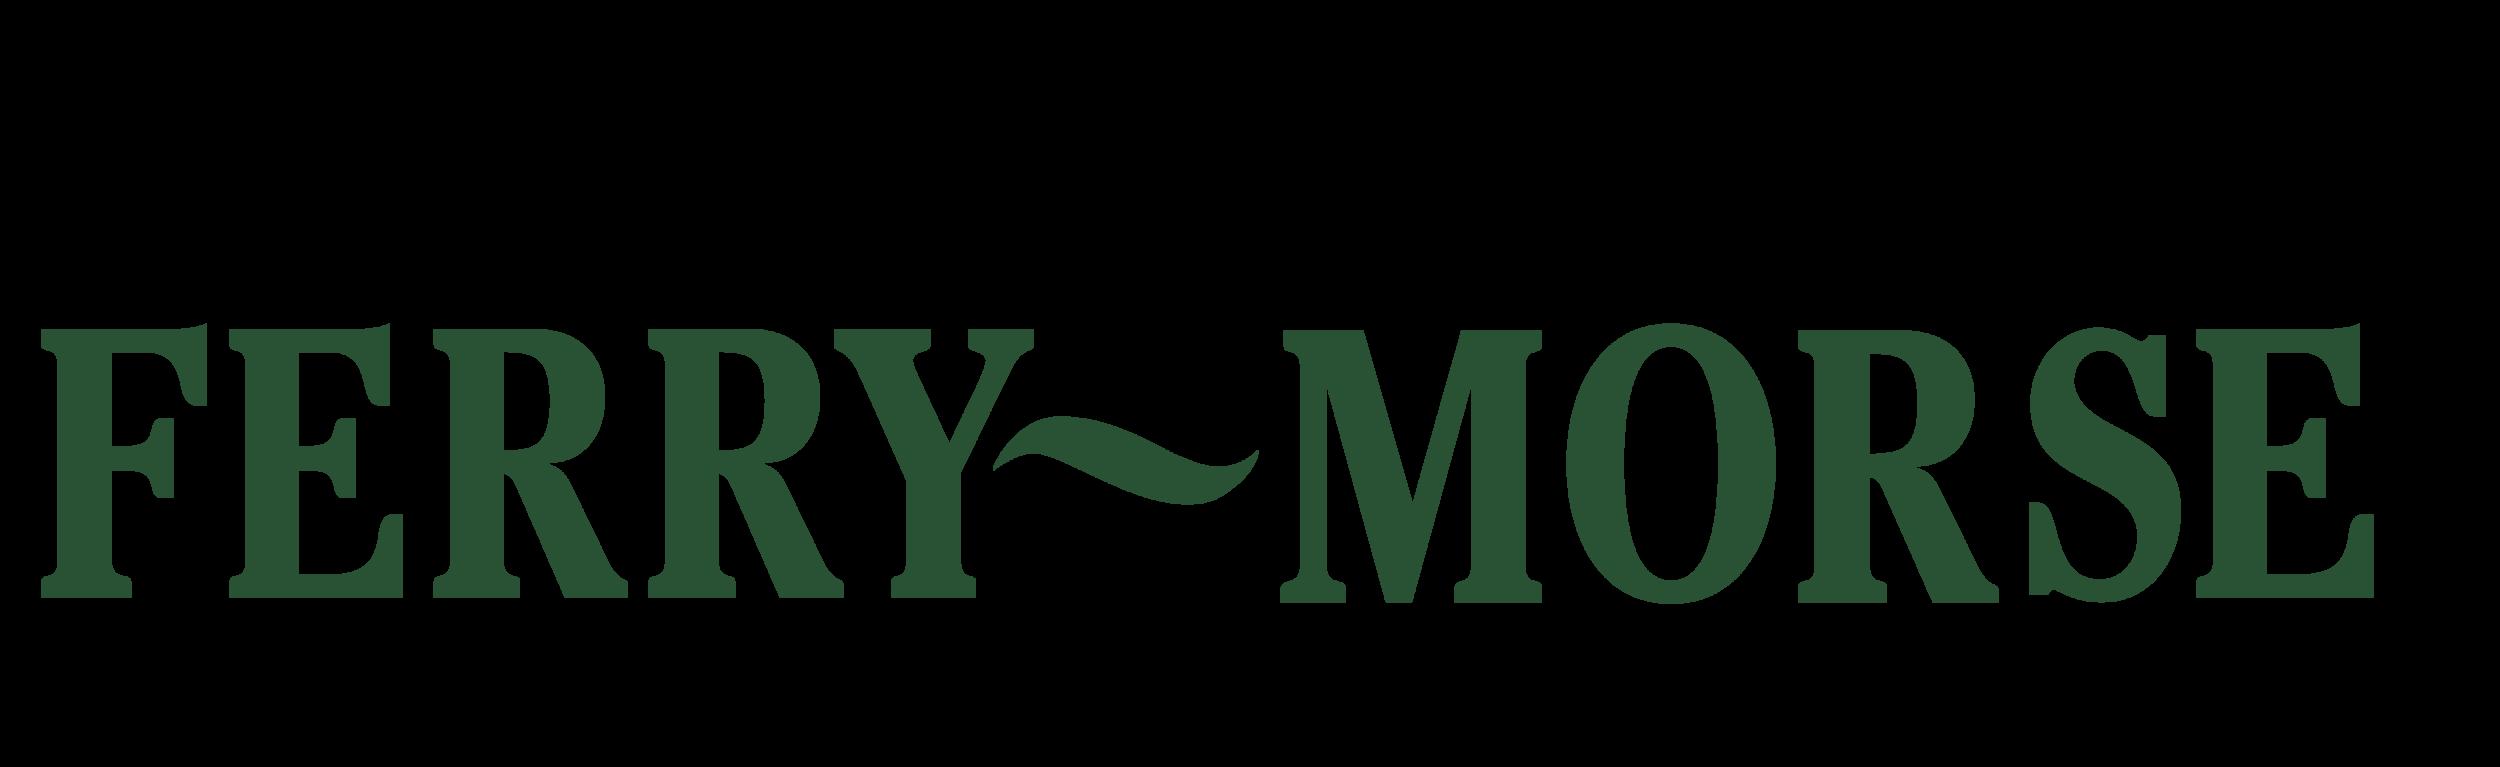 Ferry-Morse Home Gardening